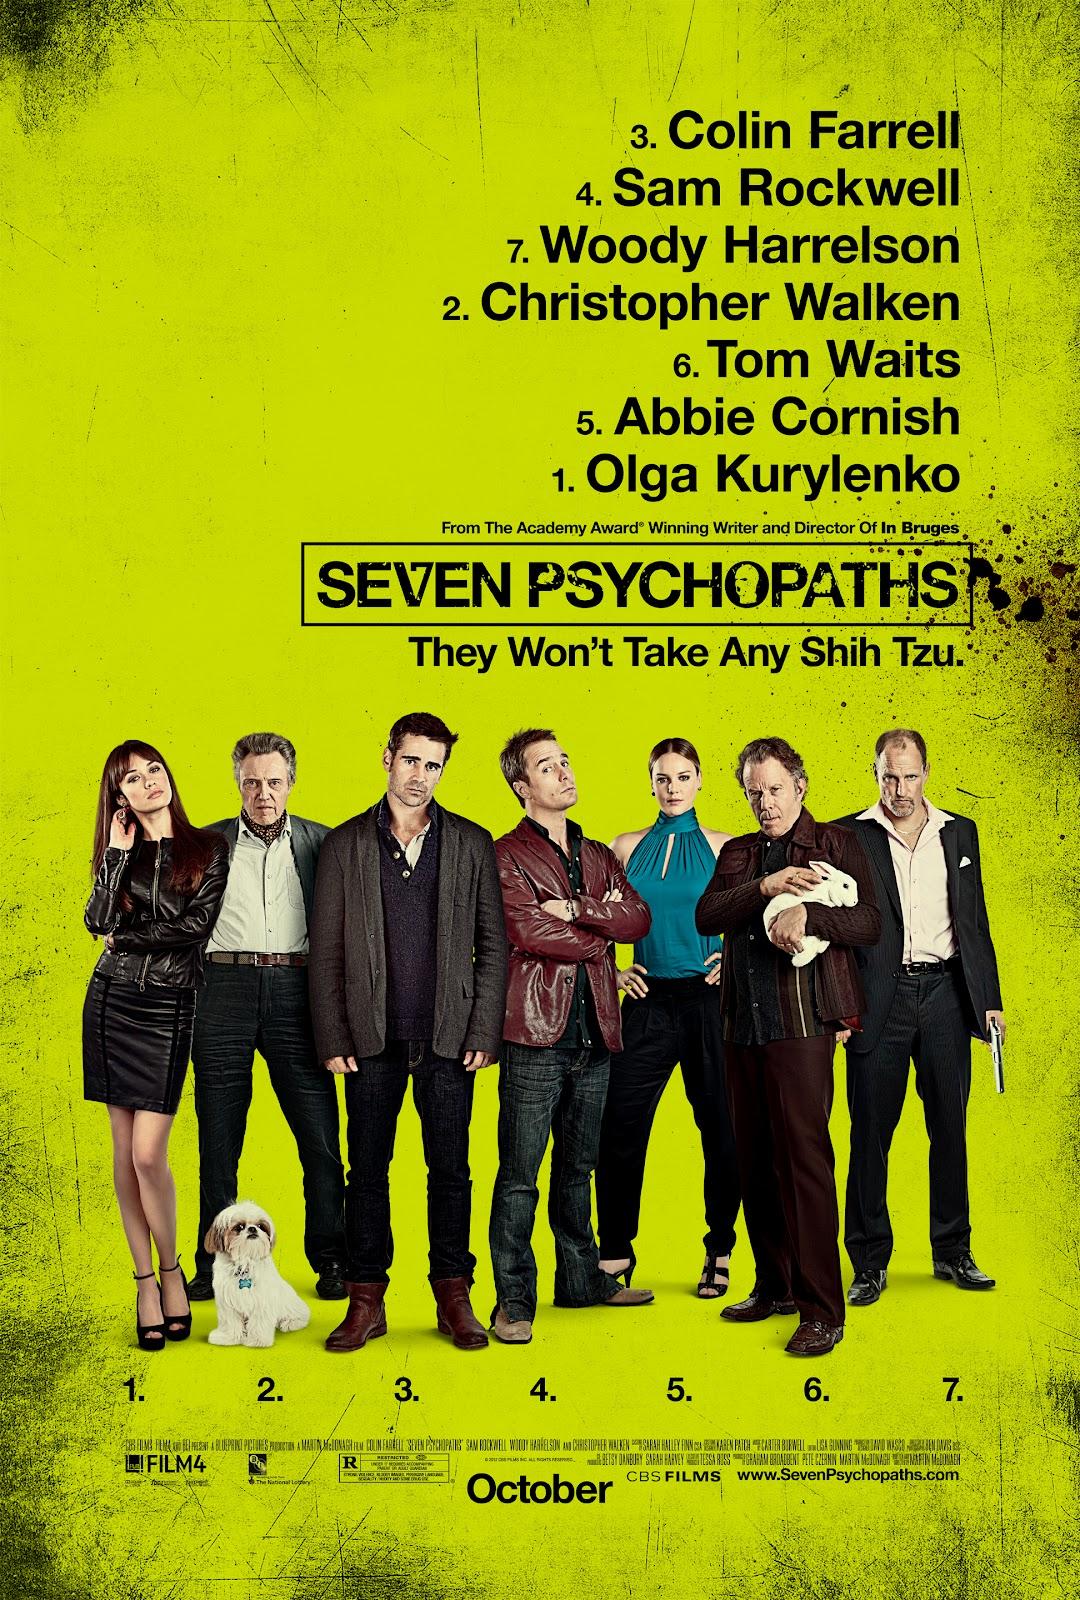 http://1.bp.blogspot.com/-WY5KL7OoutI/UEqT_4Y1hxI/AAAAAAAAG5c/TvBXaDTvPcQ/s1600/seven-psychopaths-7Psy_OneSheet_LoRes_rgb.jpg